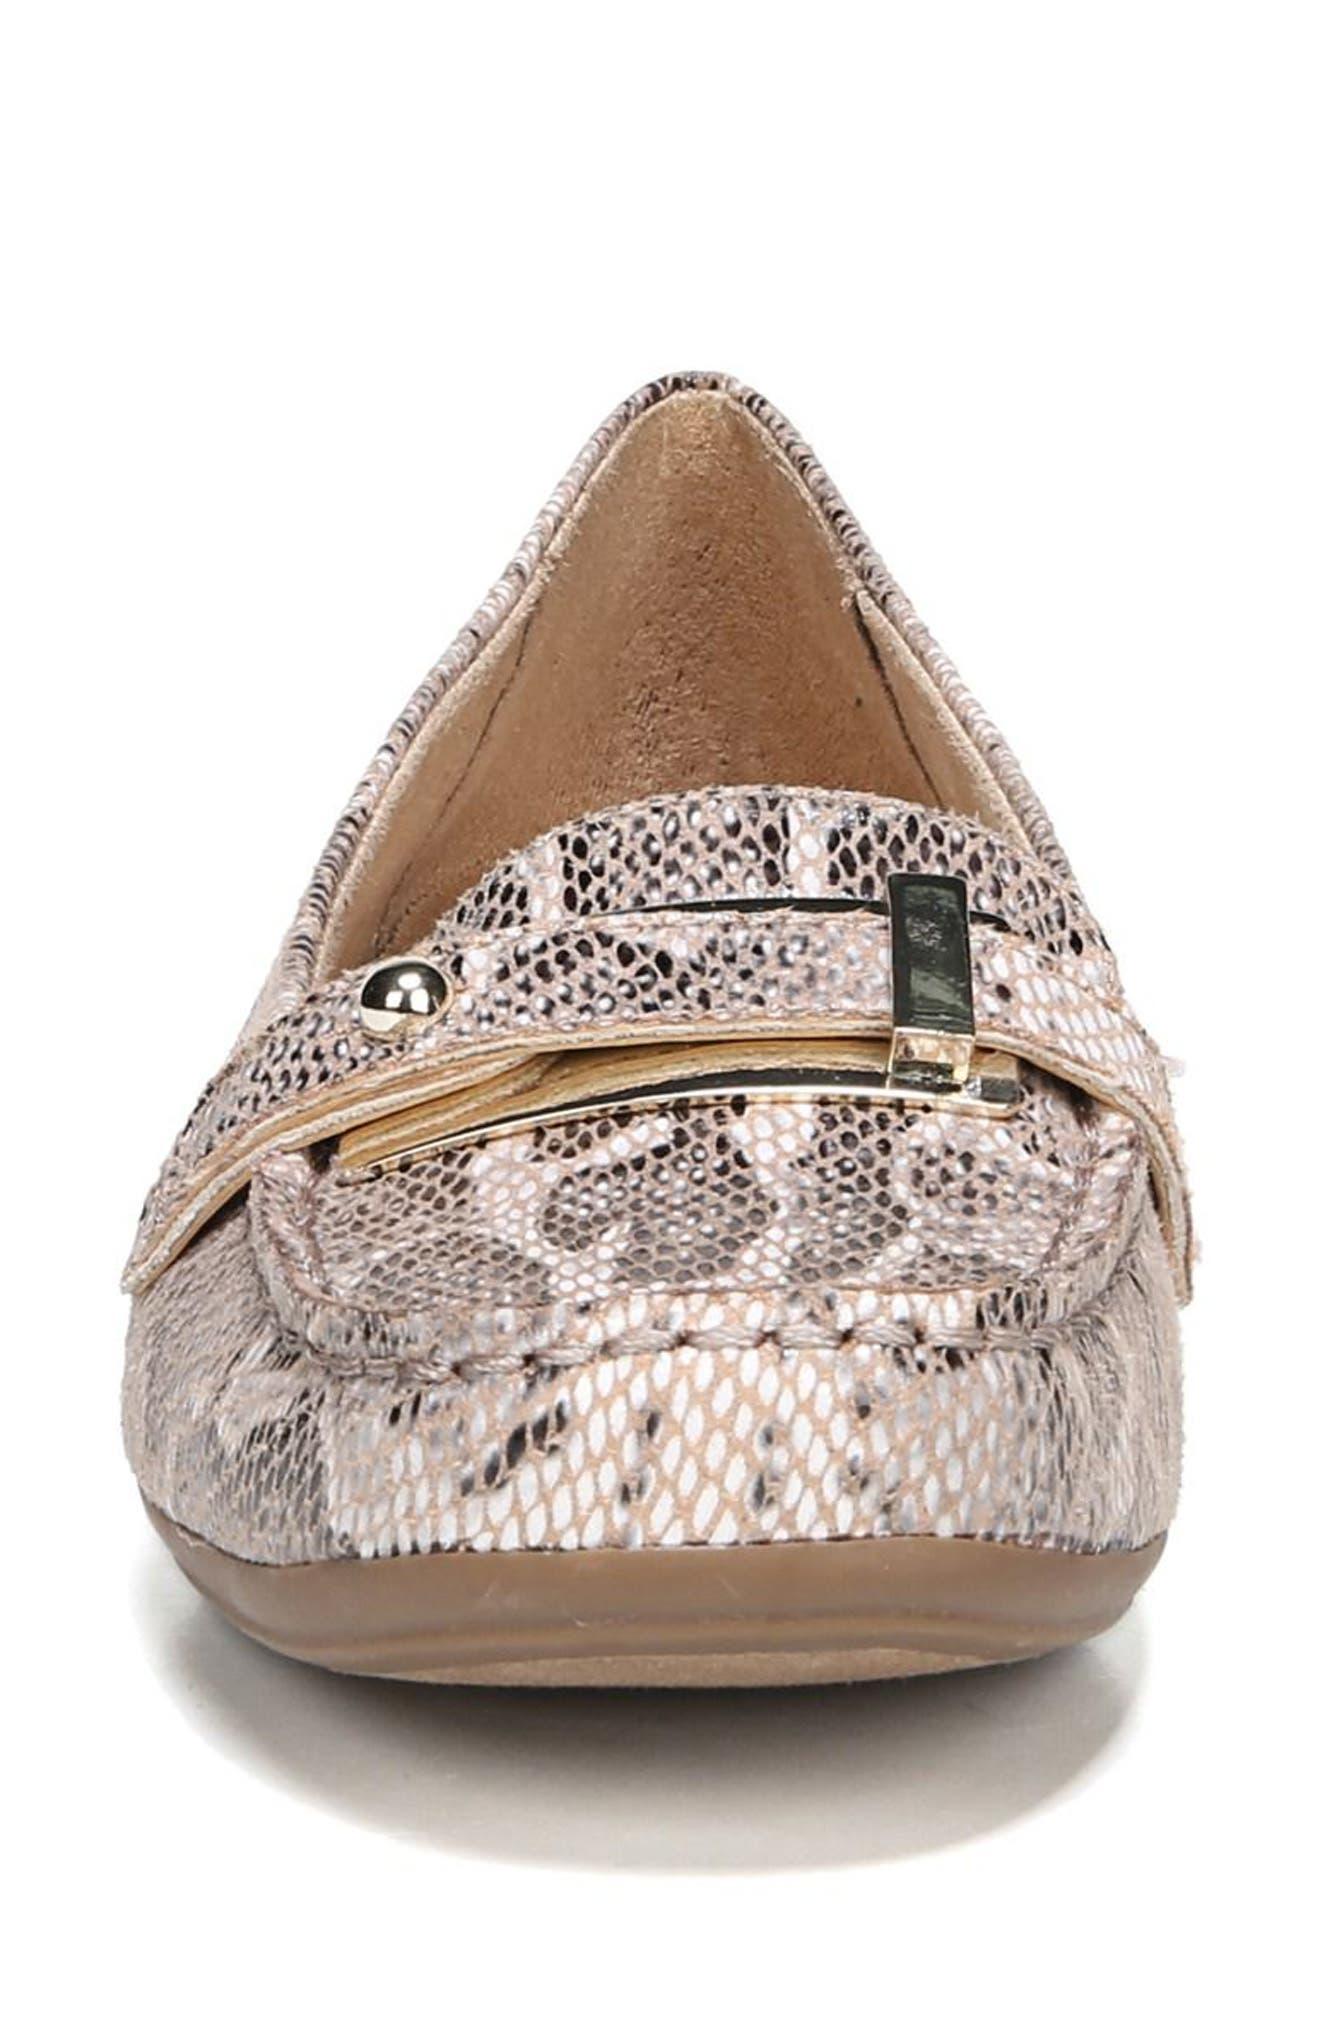 'Gisella' Loafer,                             Alternate thumbnail 4, color,                             Mauve Print Fabric